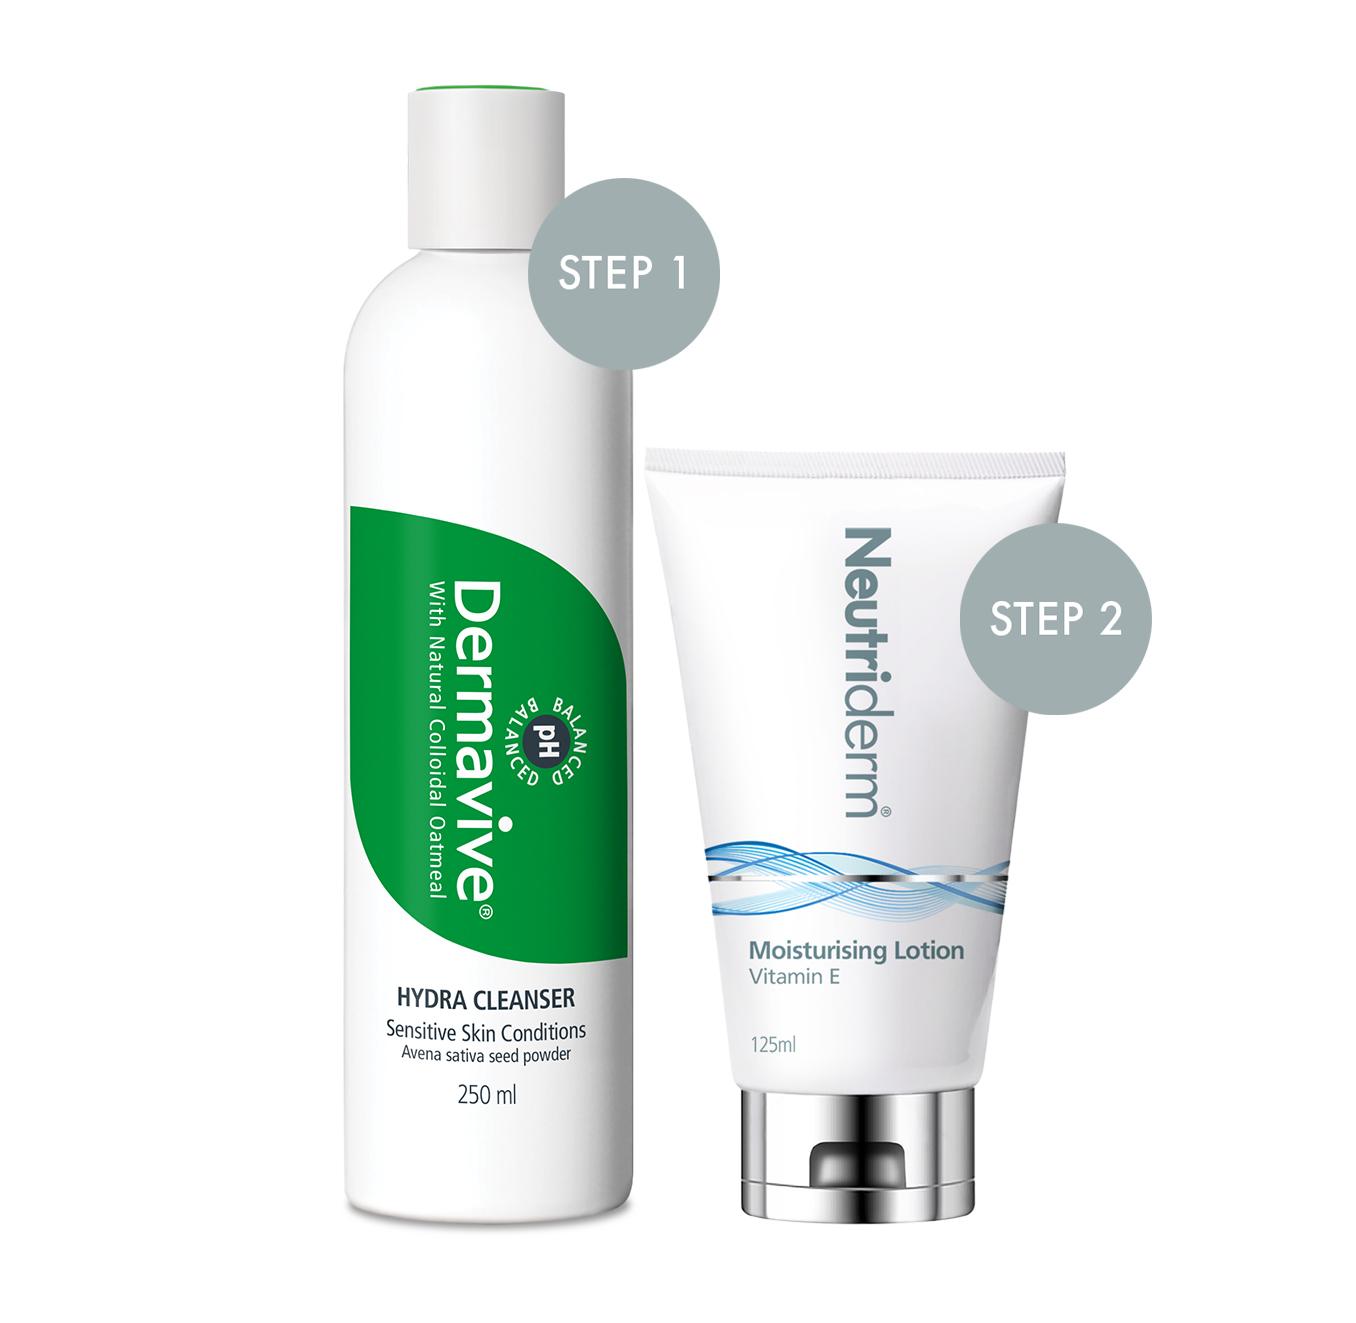 Neutriderm Pre-Makeup Skincare Combo 2